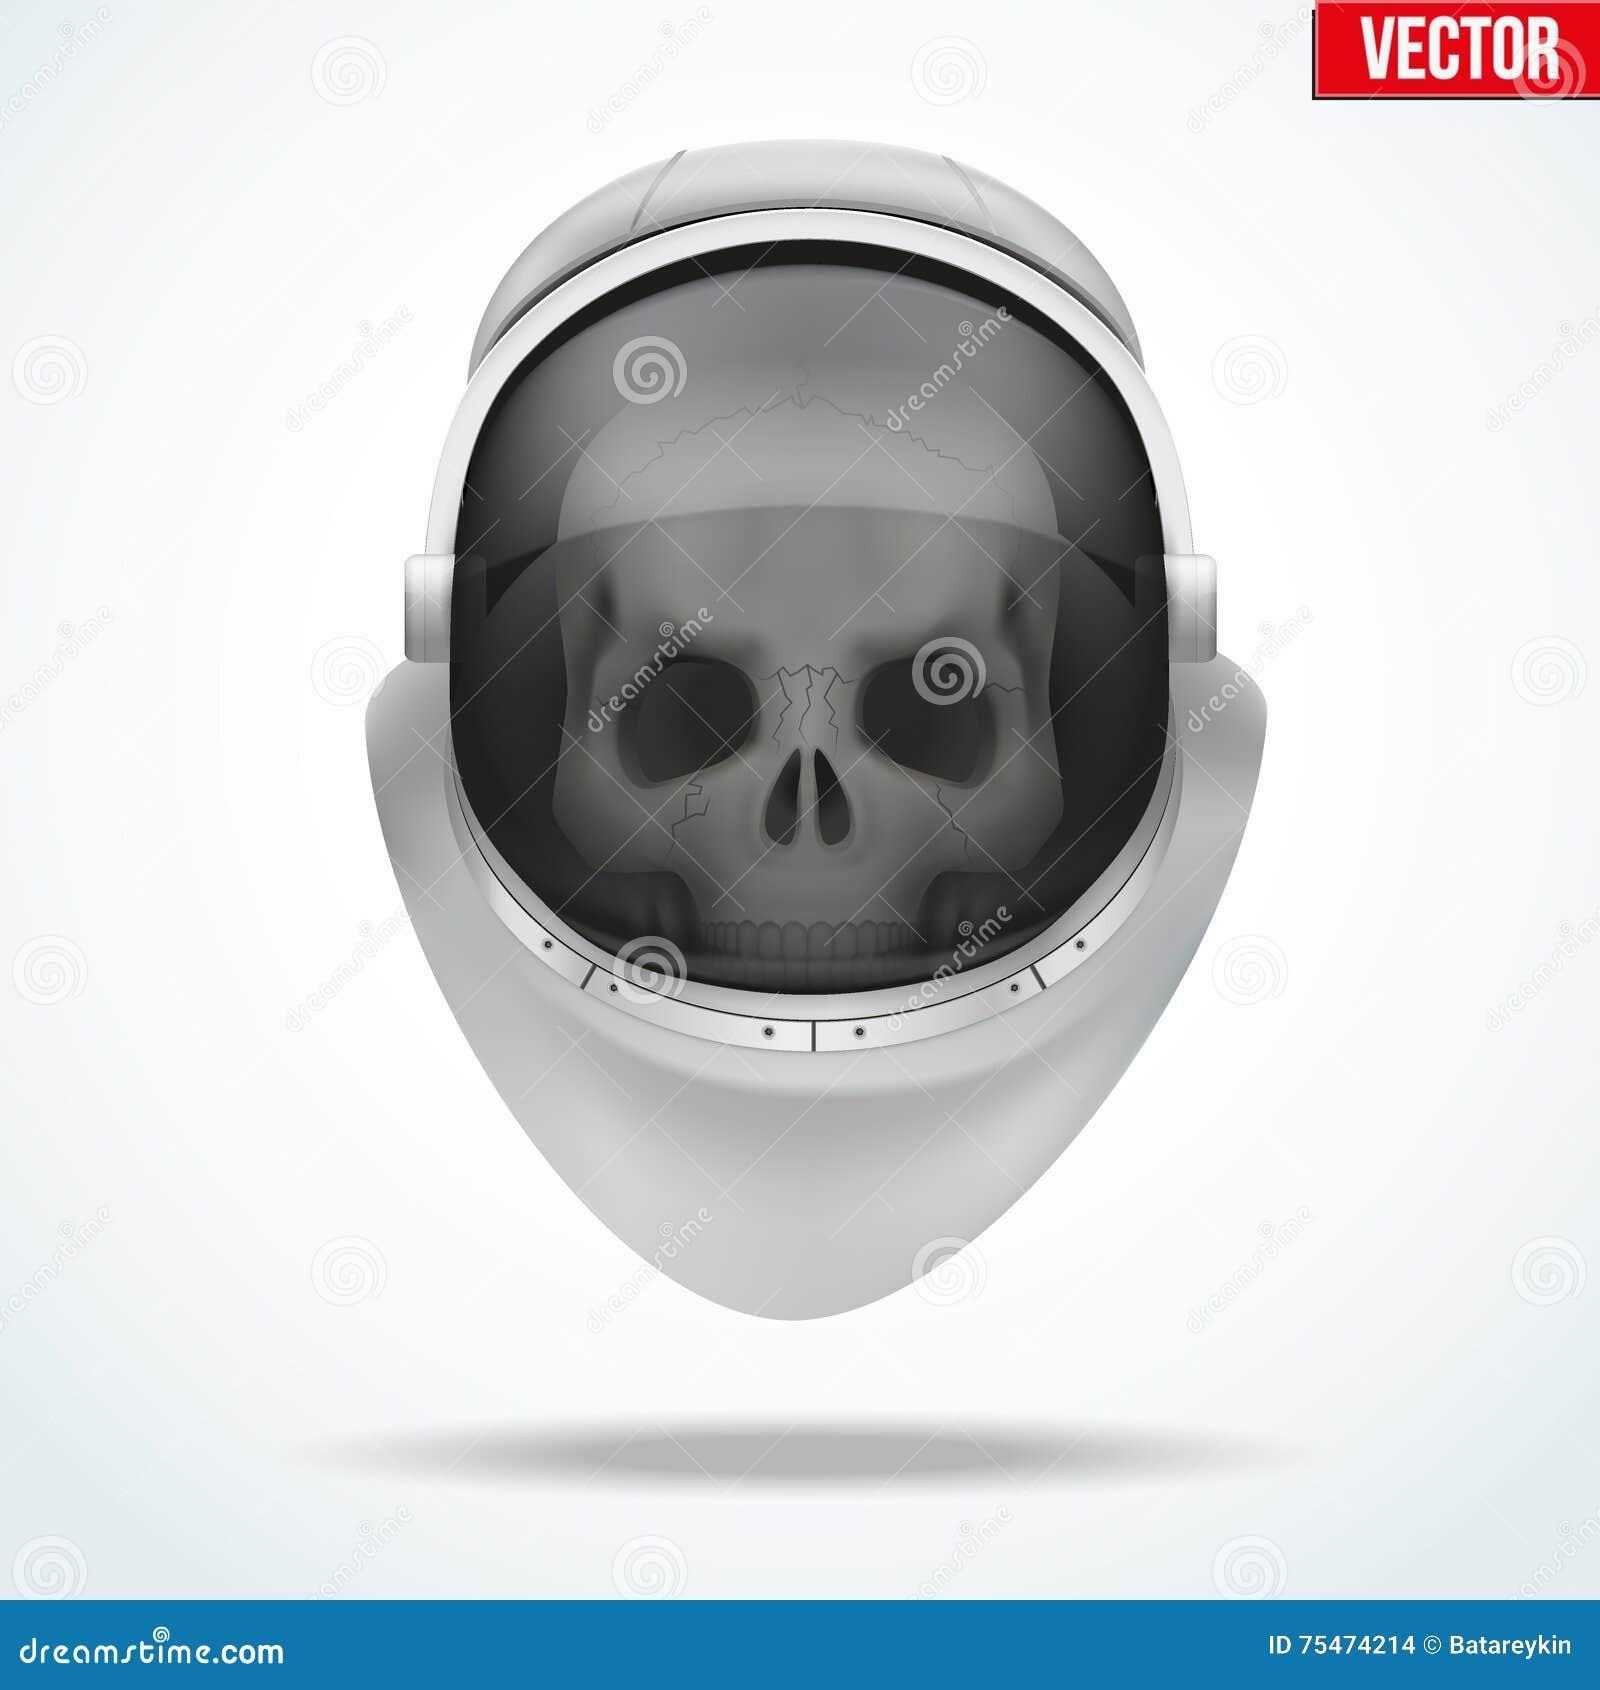 Astronaut Space Helmet With Skull Behind Visor Glass Stock ...